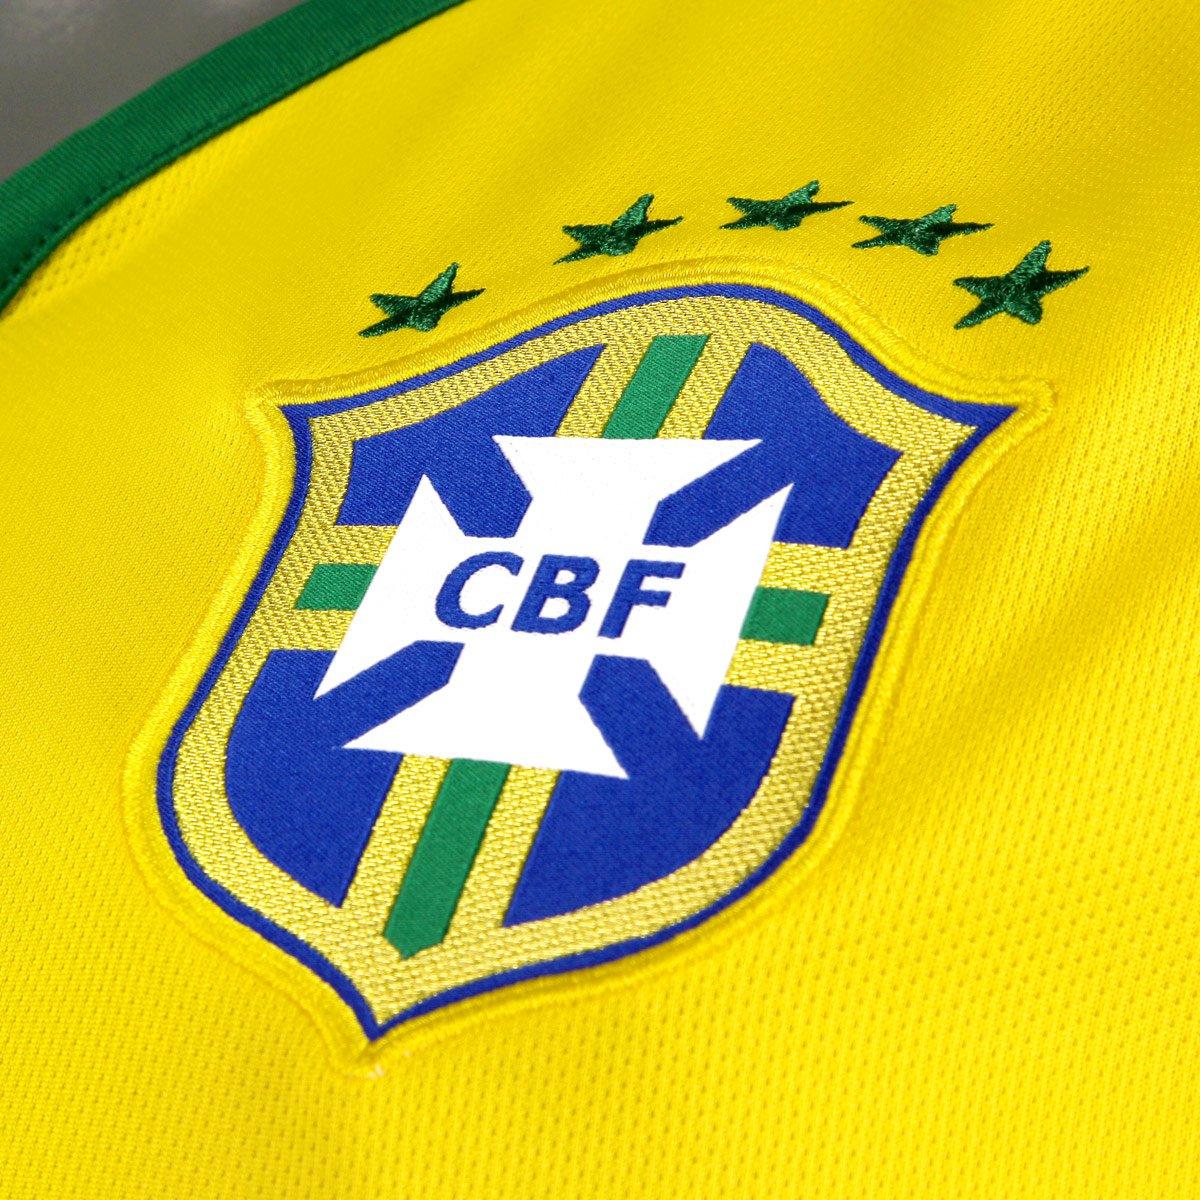 Camisa Seleção Brasil I 14 15 nº 10 - Torcedor Nike Masculina ... a8fa7f5713b34